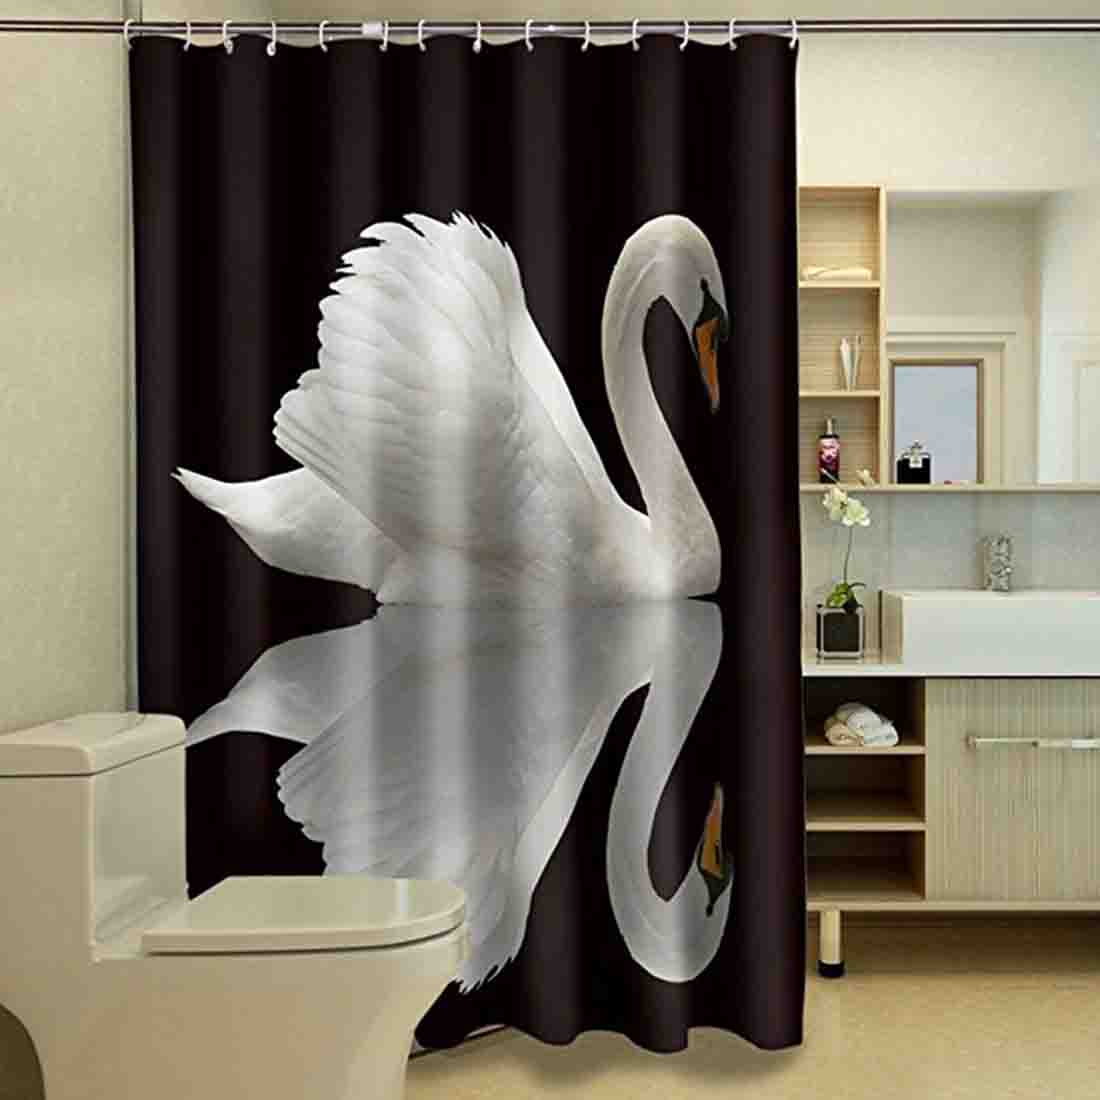 Swan Printed Bath Shower Curtains Bathroom Curtain Shower Cover For Bathroom Hanging Decoration Bathroom Products